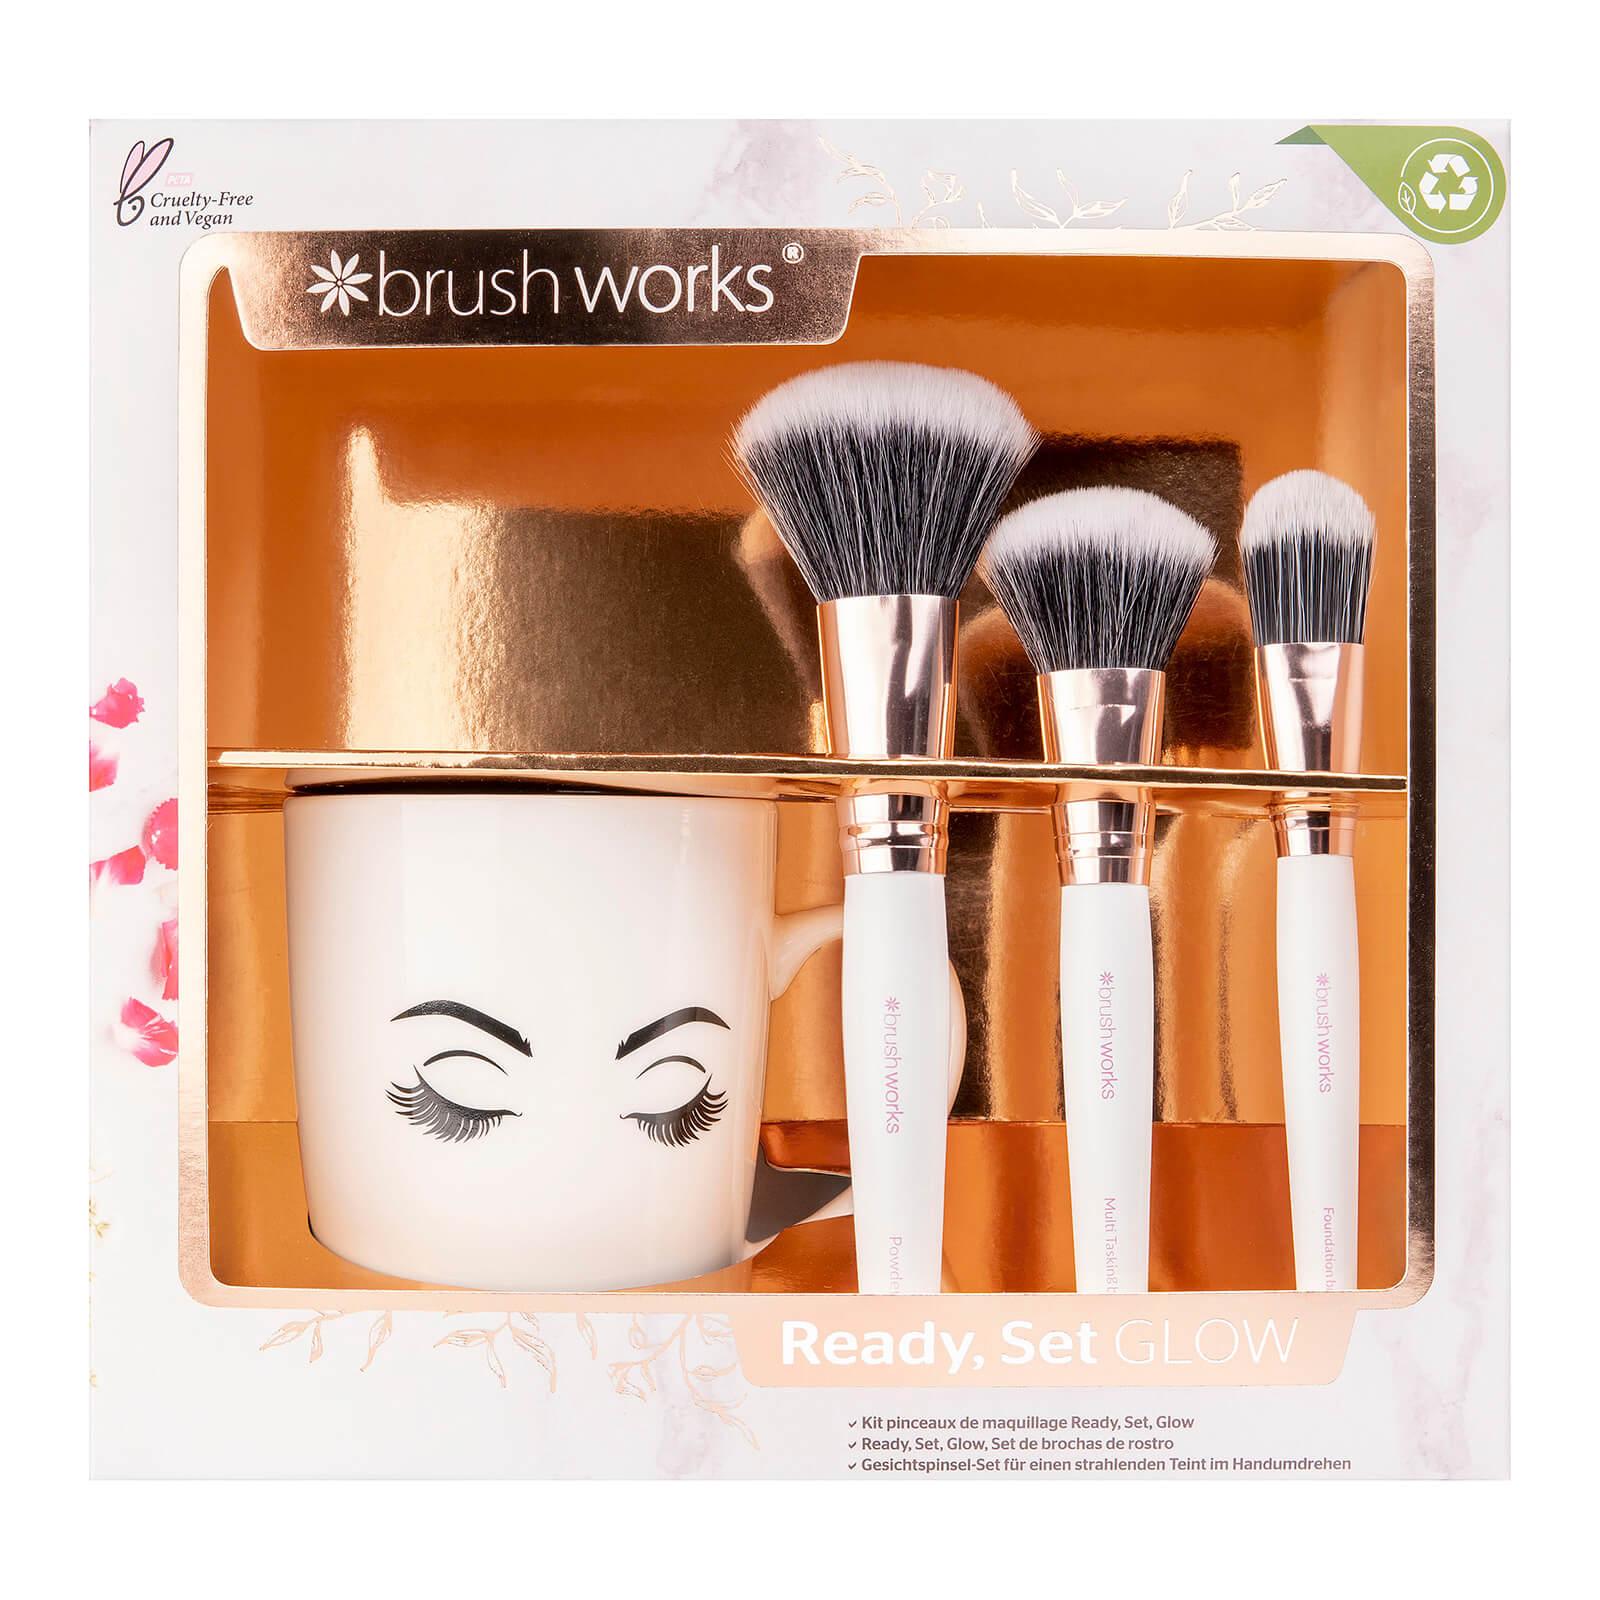 Купить Brushworks Ready Set Glow Face Brush Set